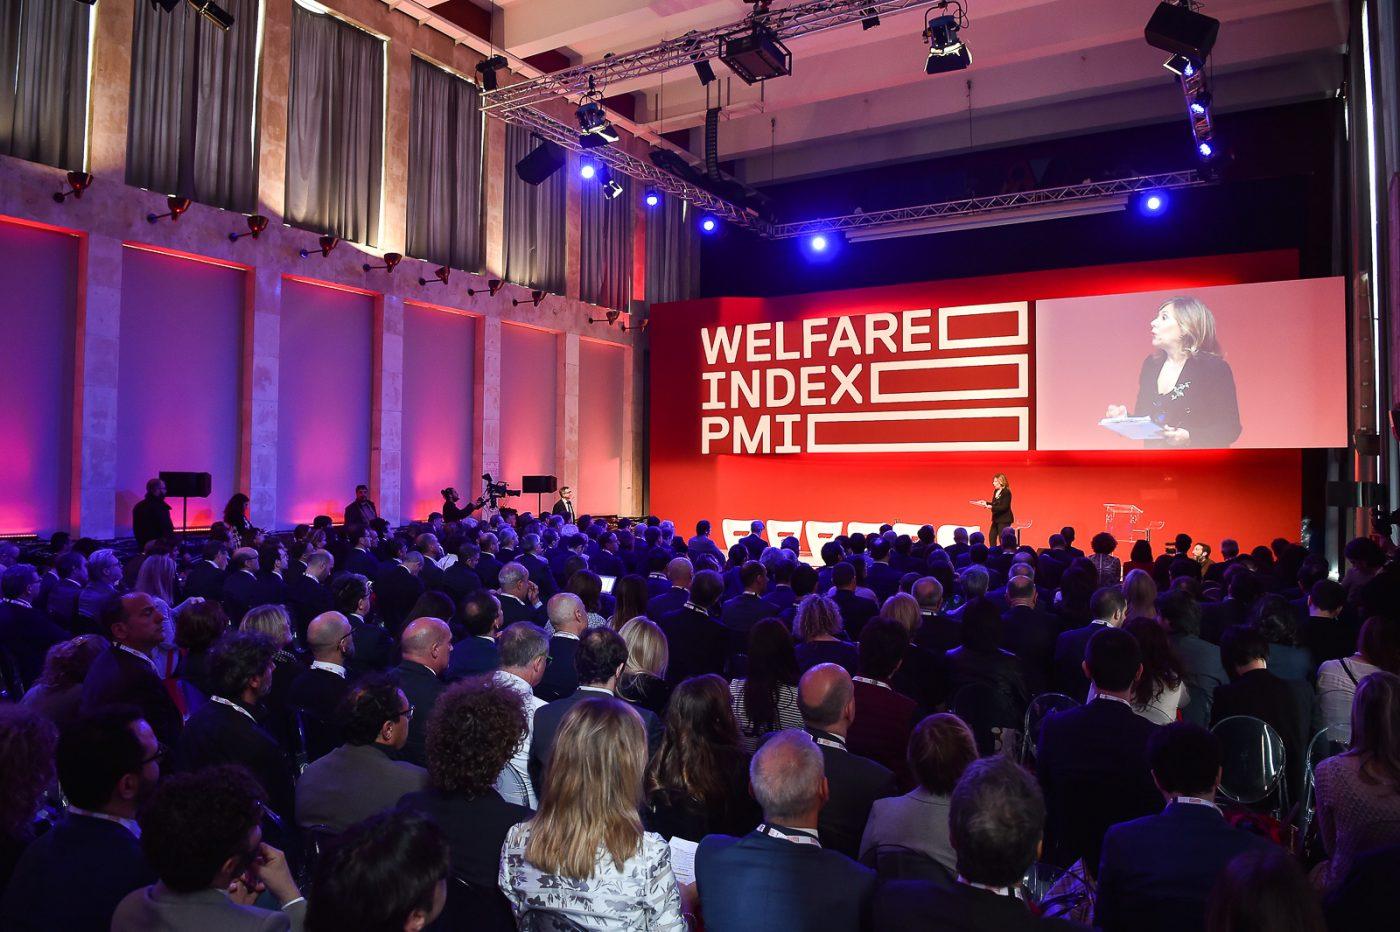 Welfare Index PMI, edizione 2019